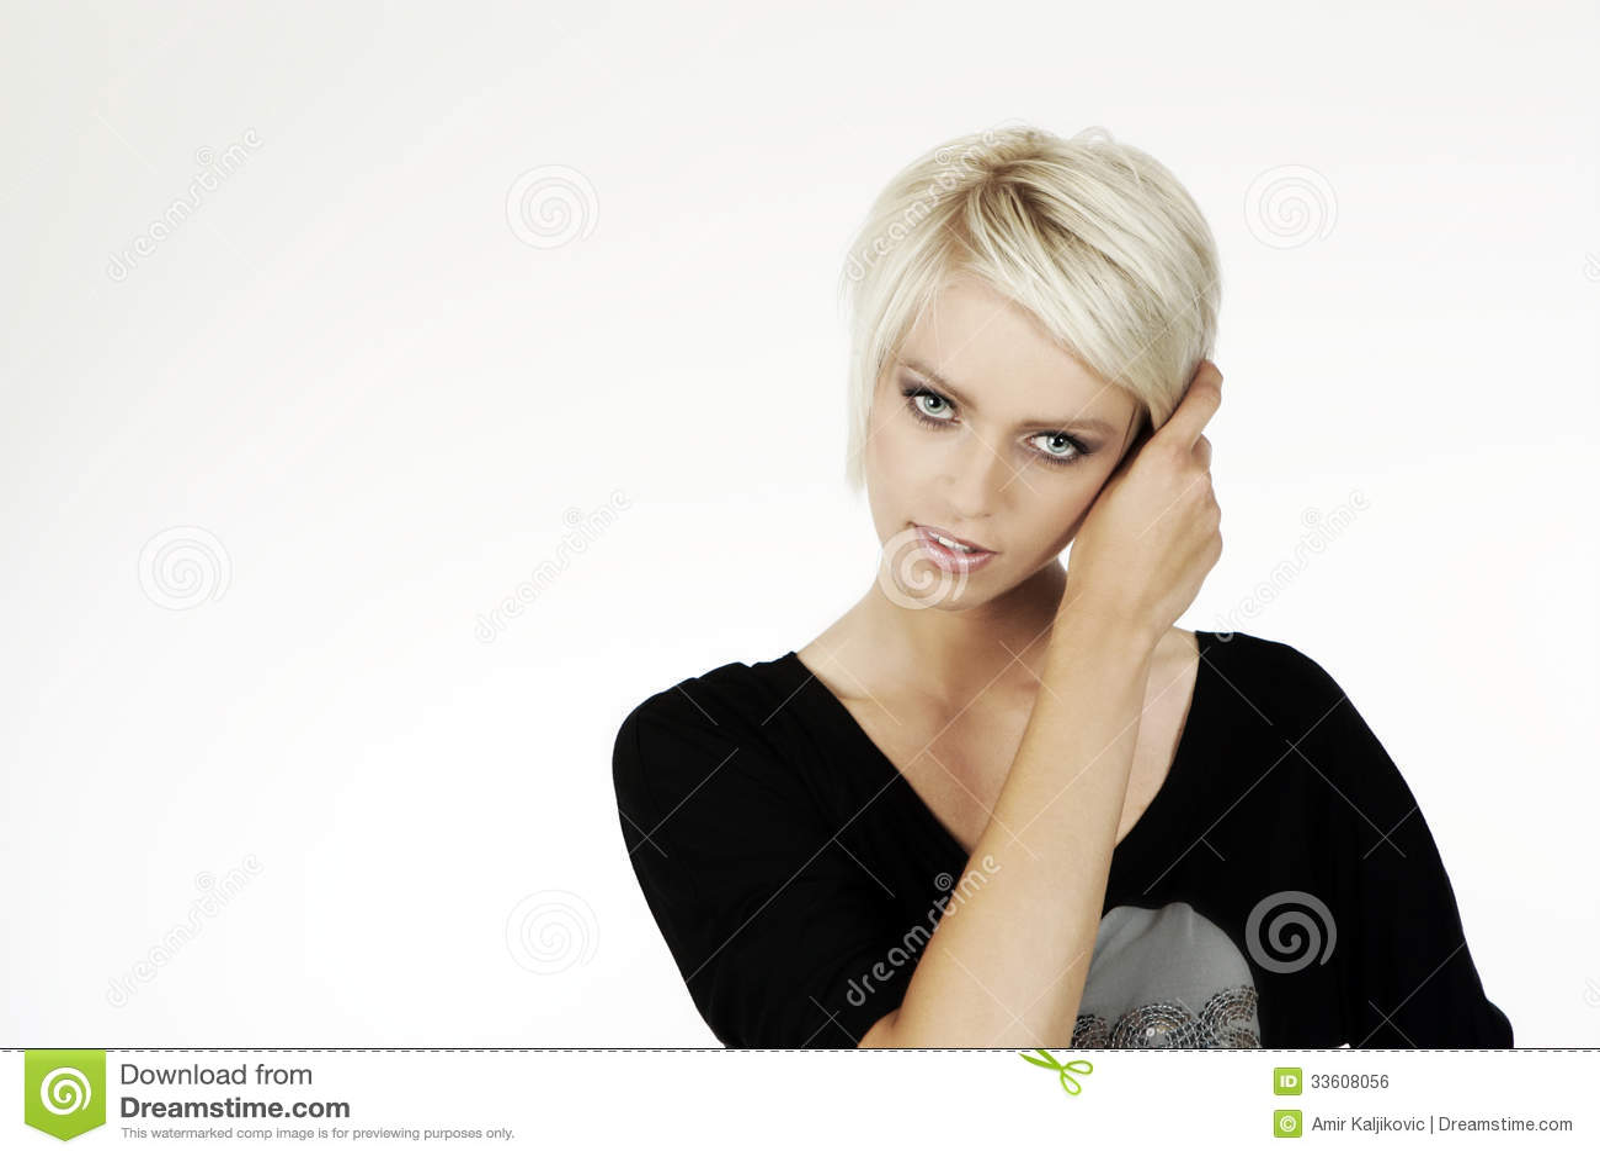 kort prostituees blond